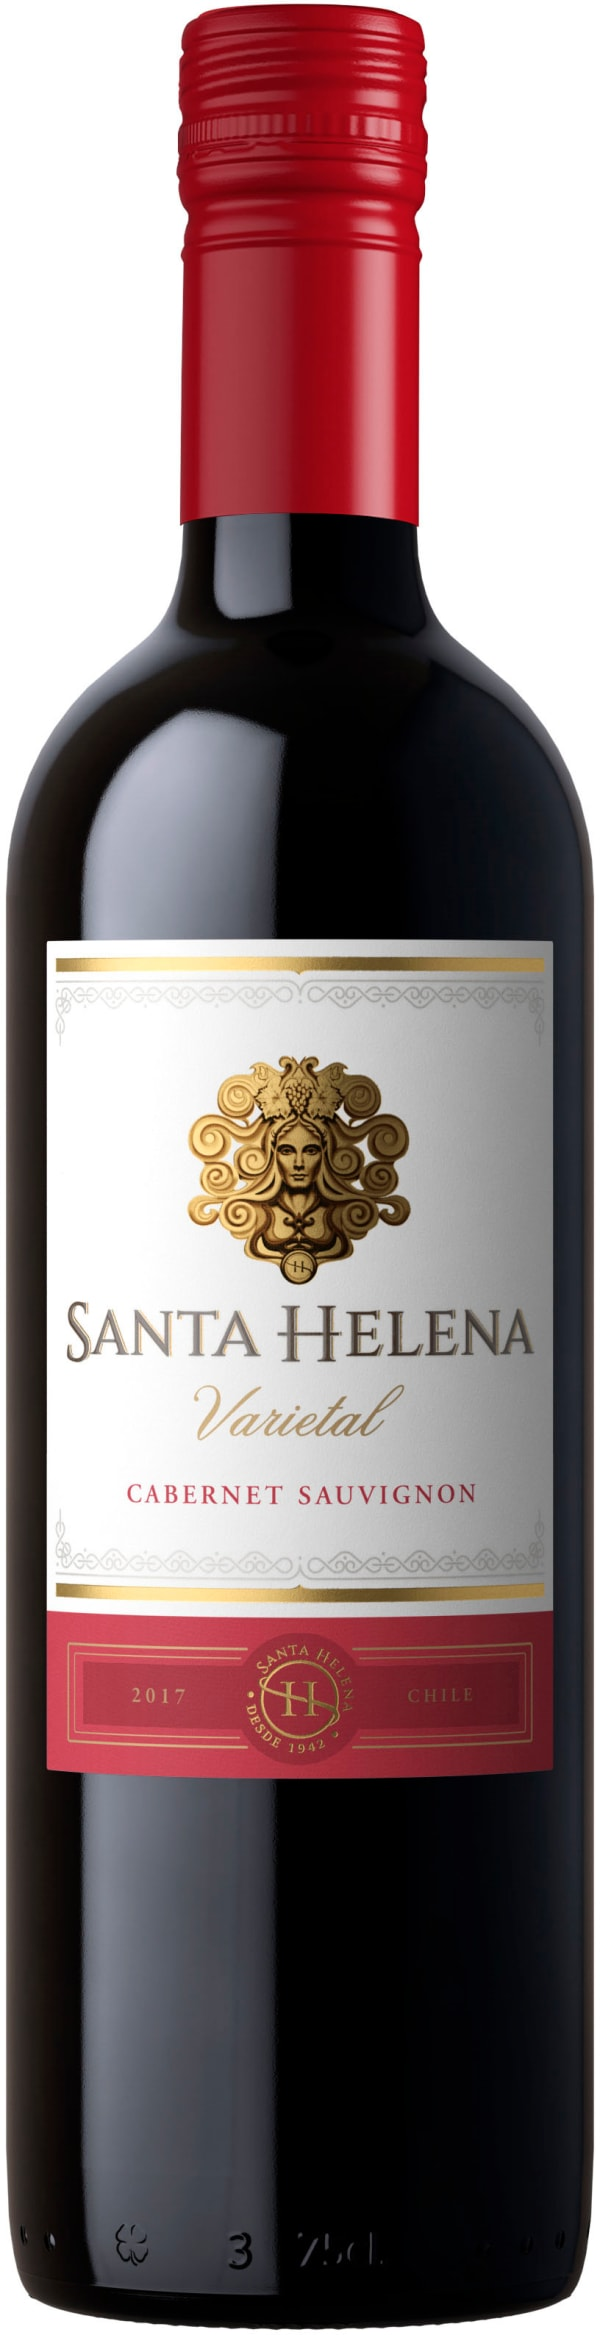 Santa Helena Varietal Cabernet Sauvignon 2017